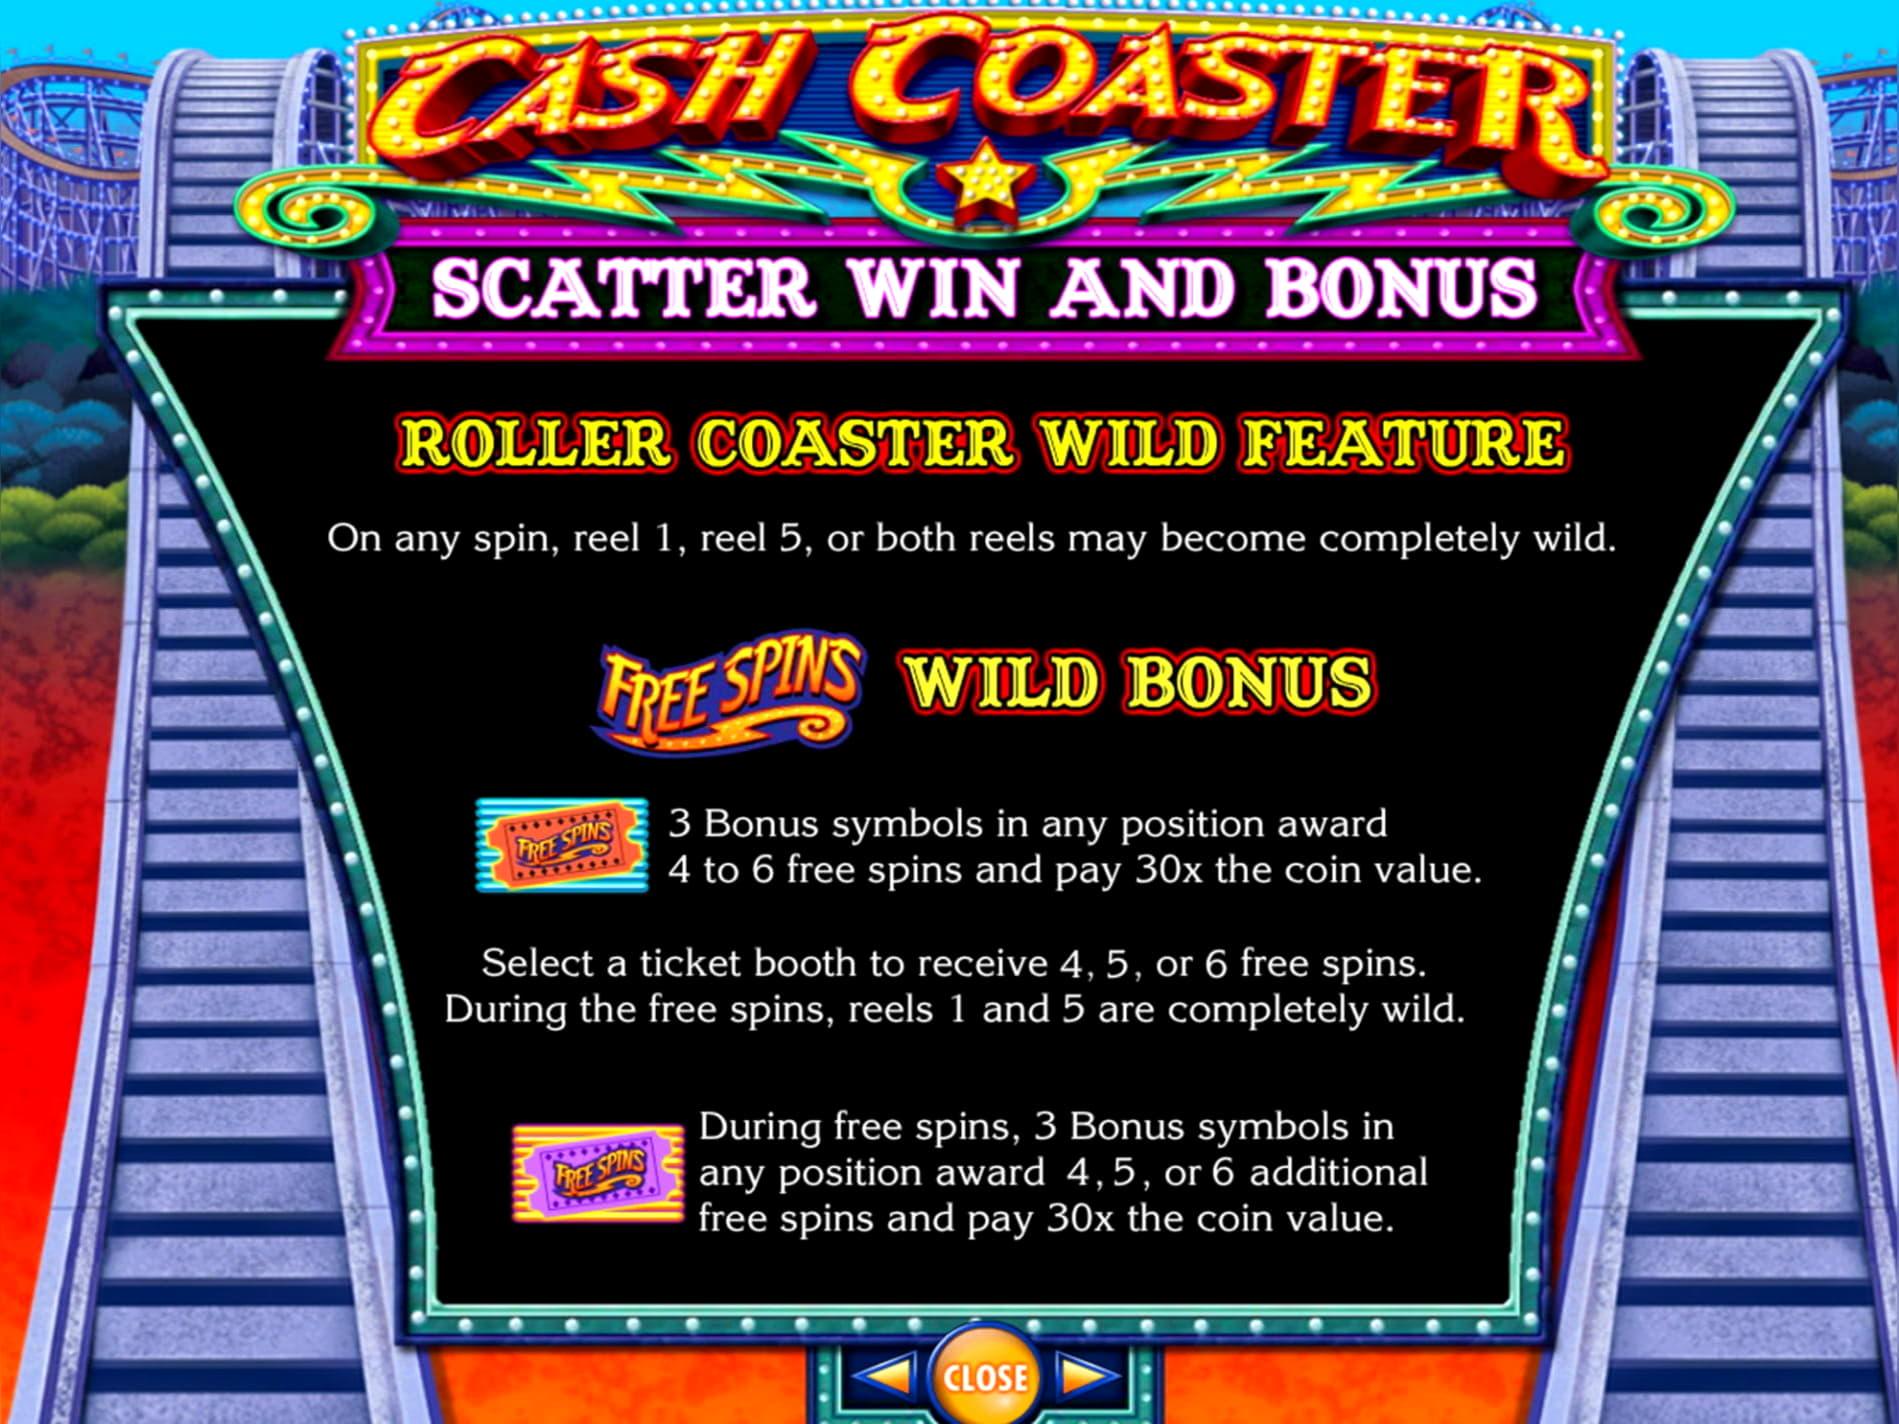 60 free spins at 888 Casino